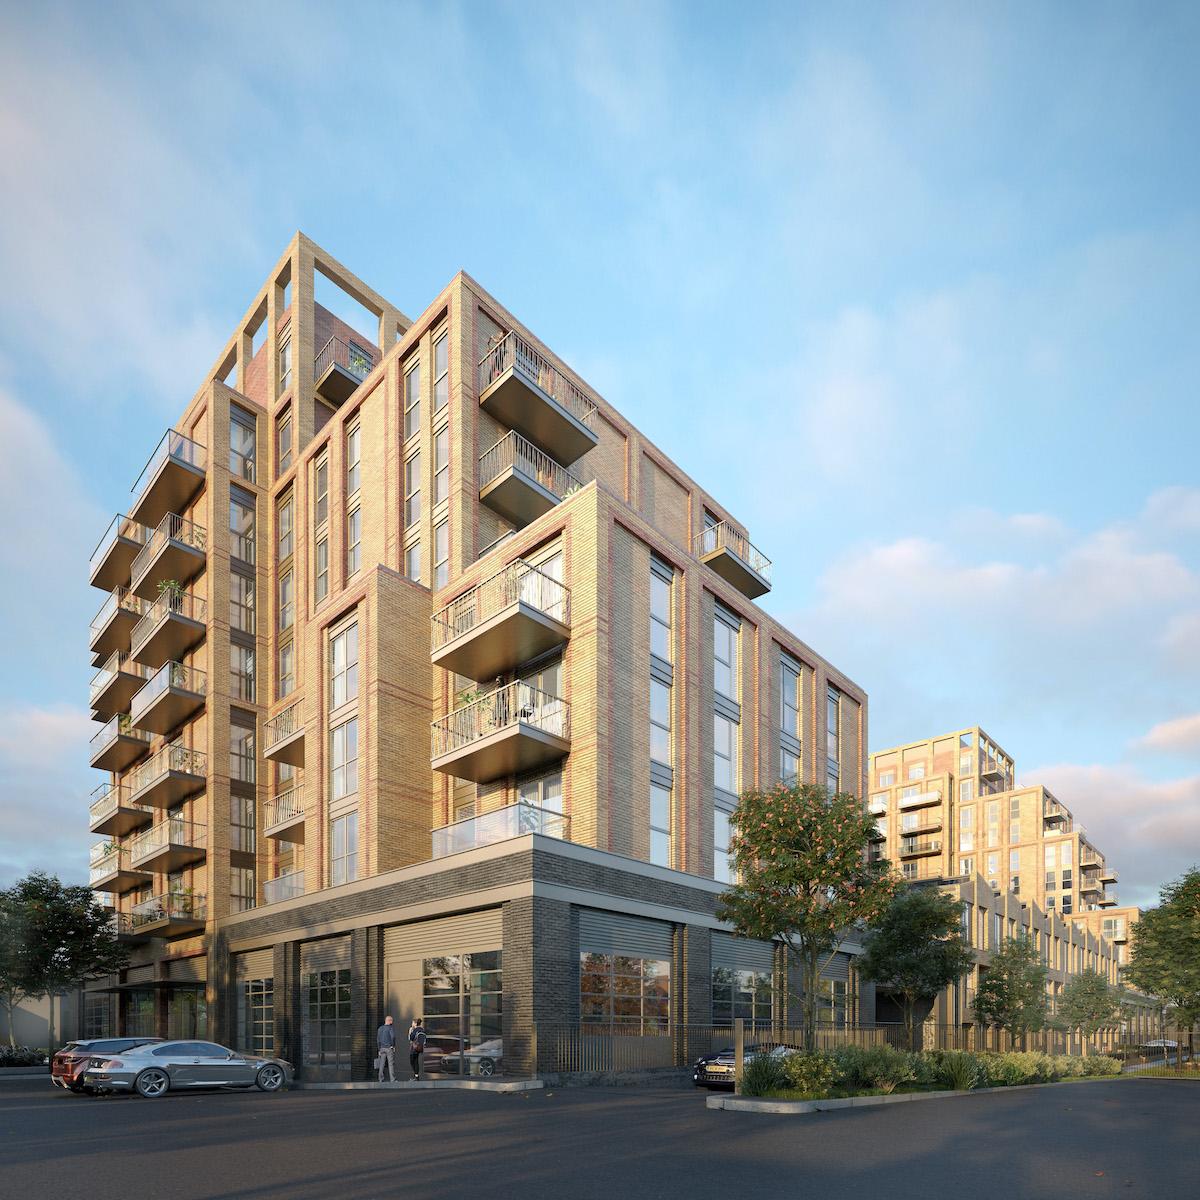 Elthorne Works development, Ealing - external view